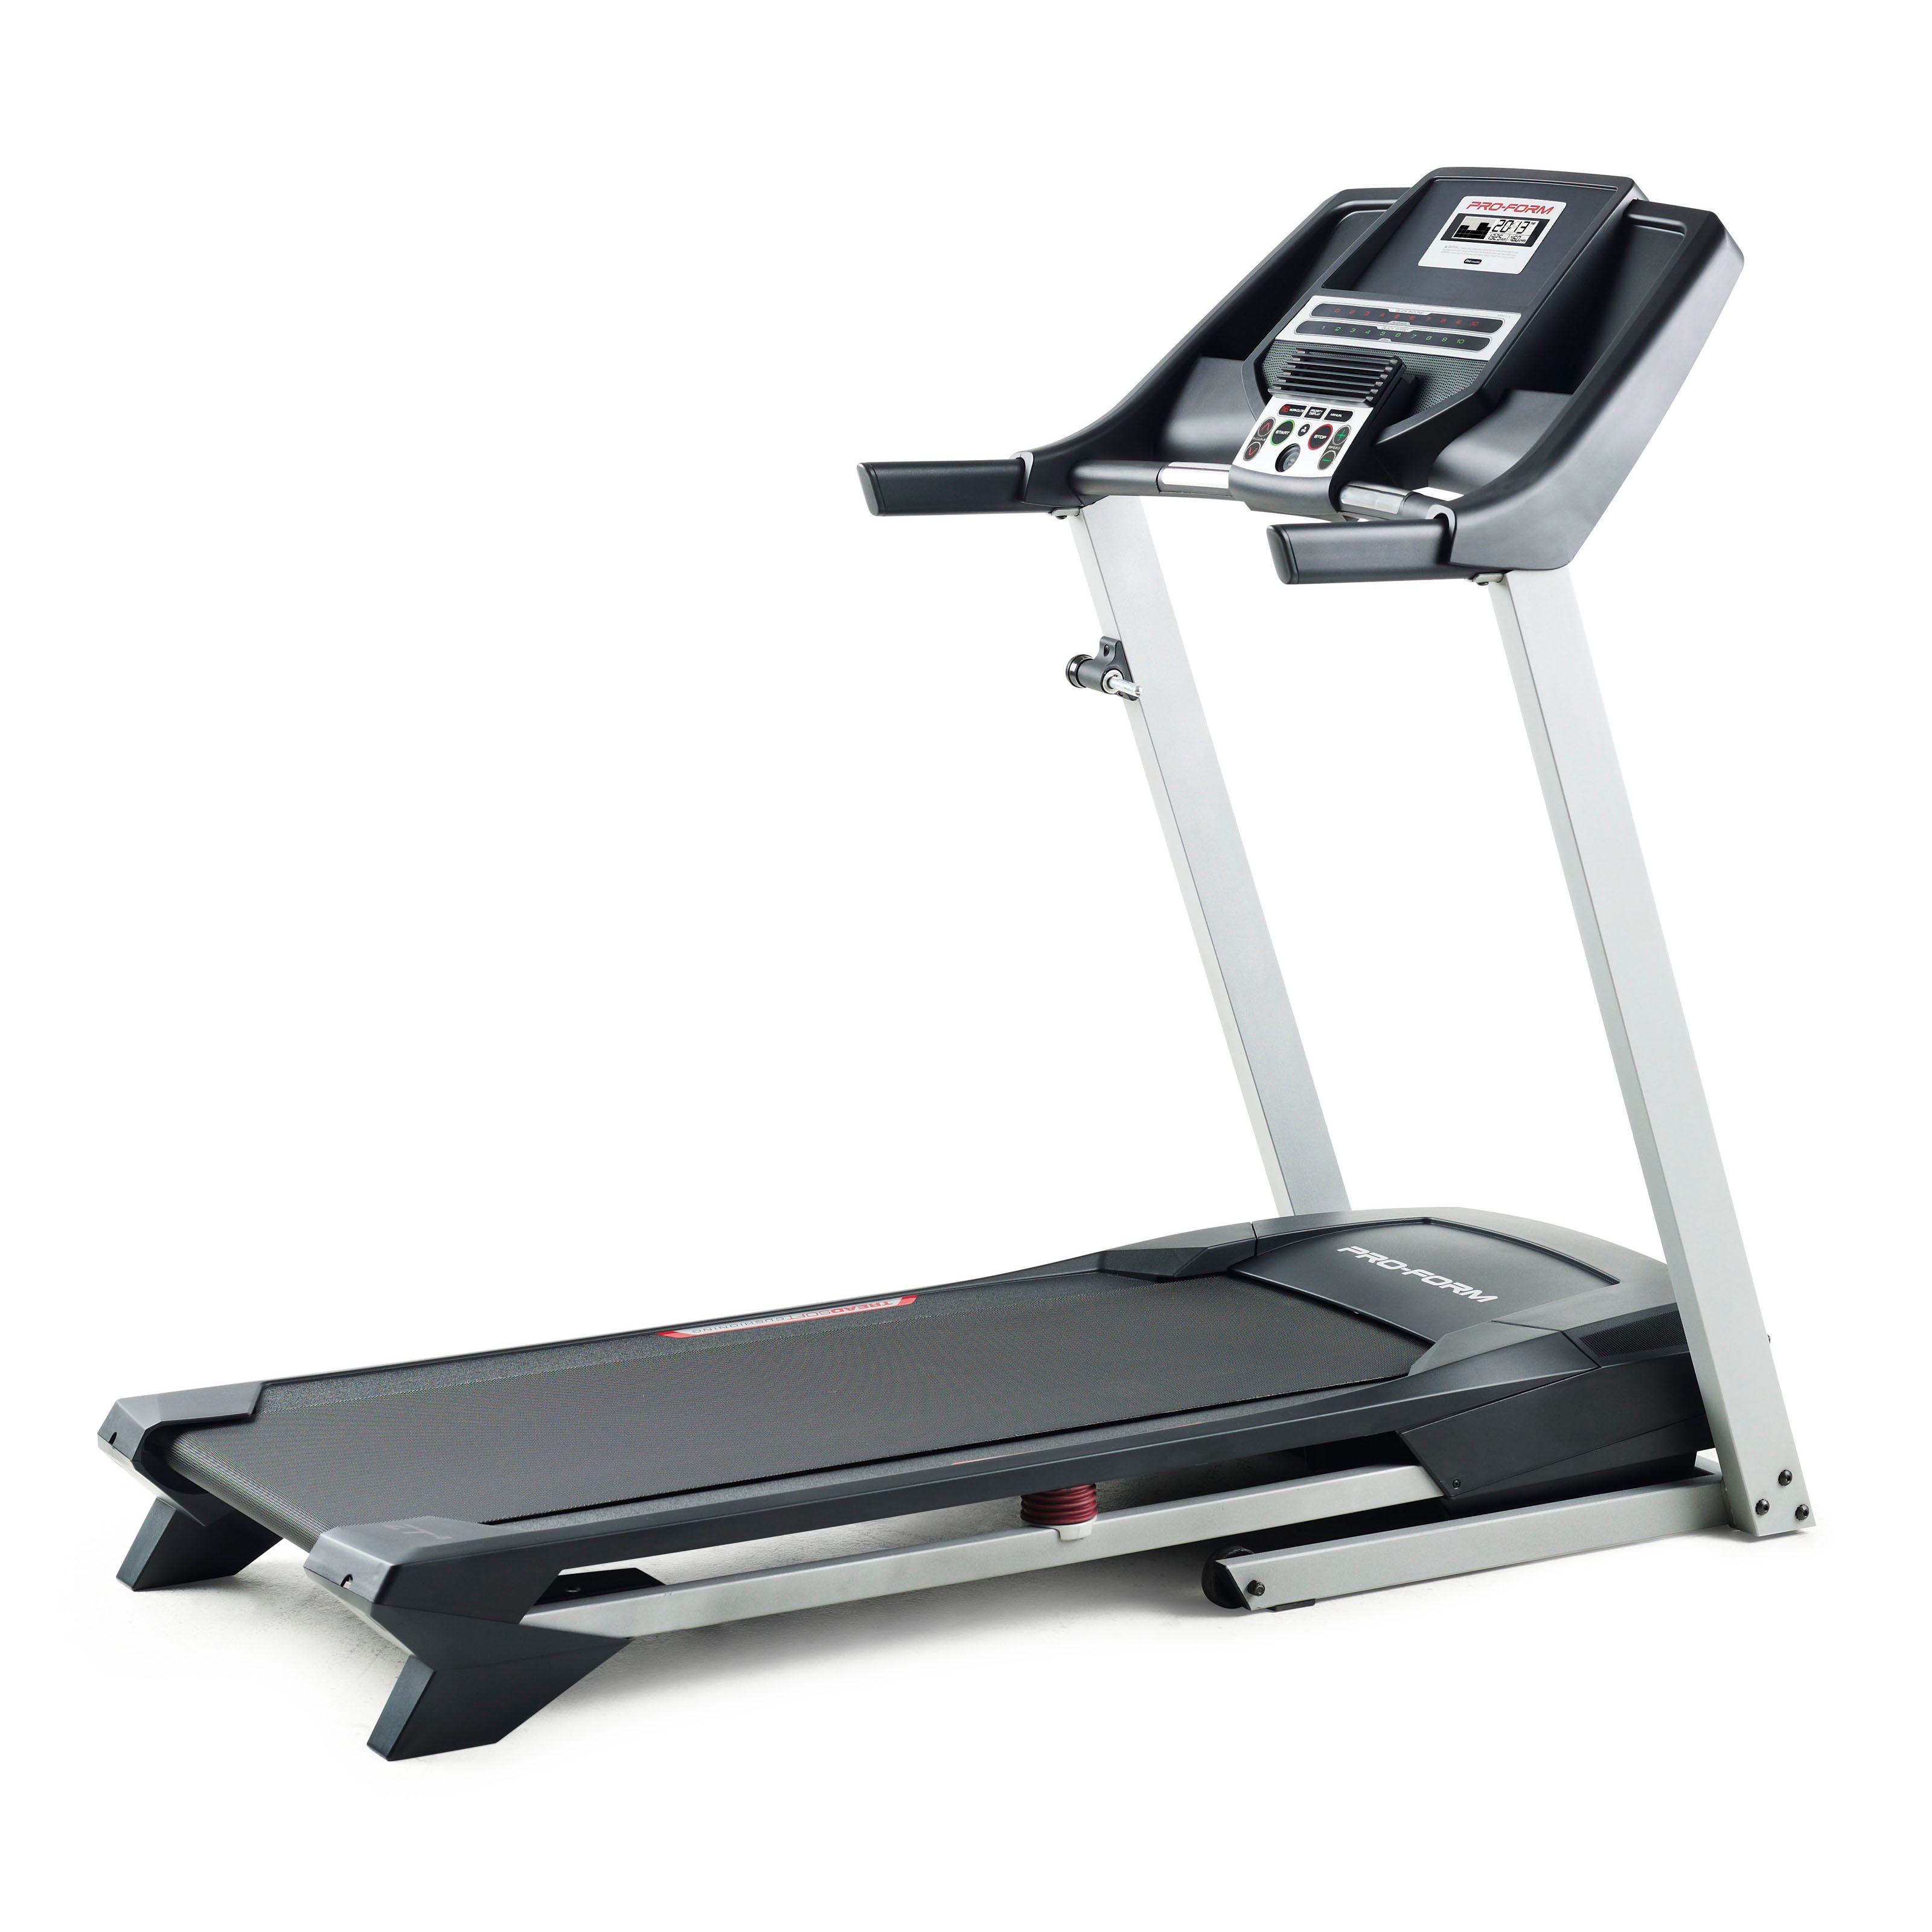 proform zt4 folding treadmill with power incline walmart com rh walmart com Proform Treadmill Parts Proform ZT6 Treadmill 2.5 CHP